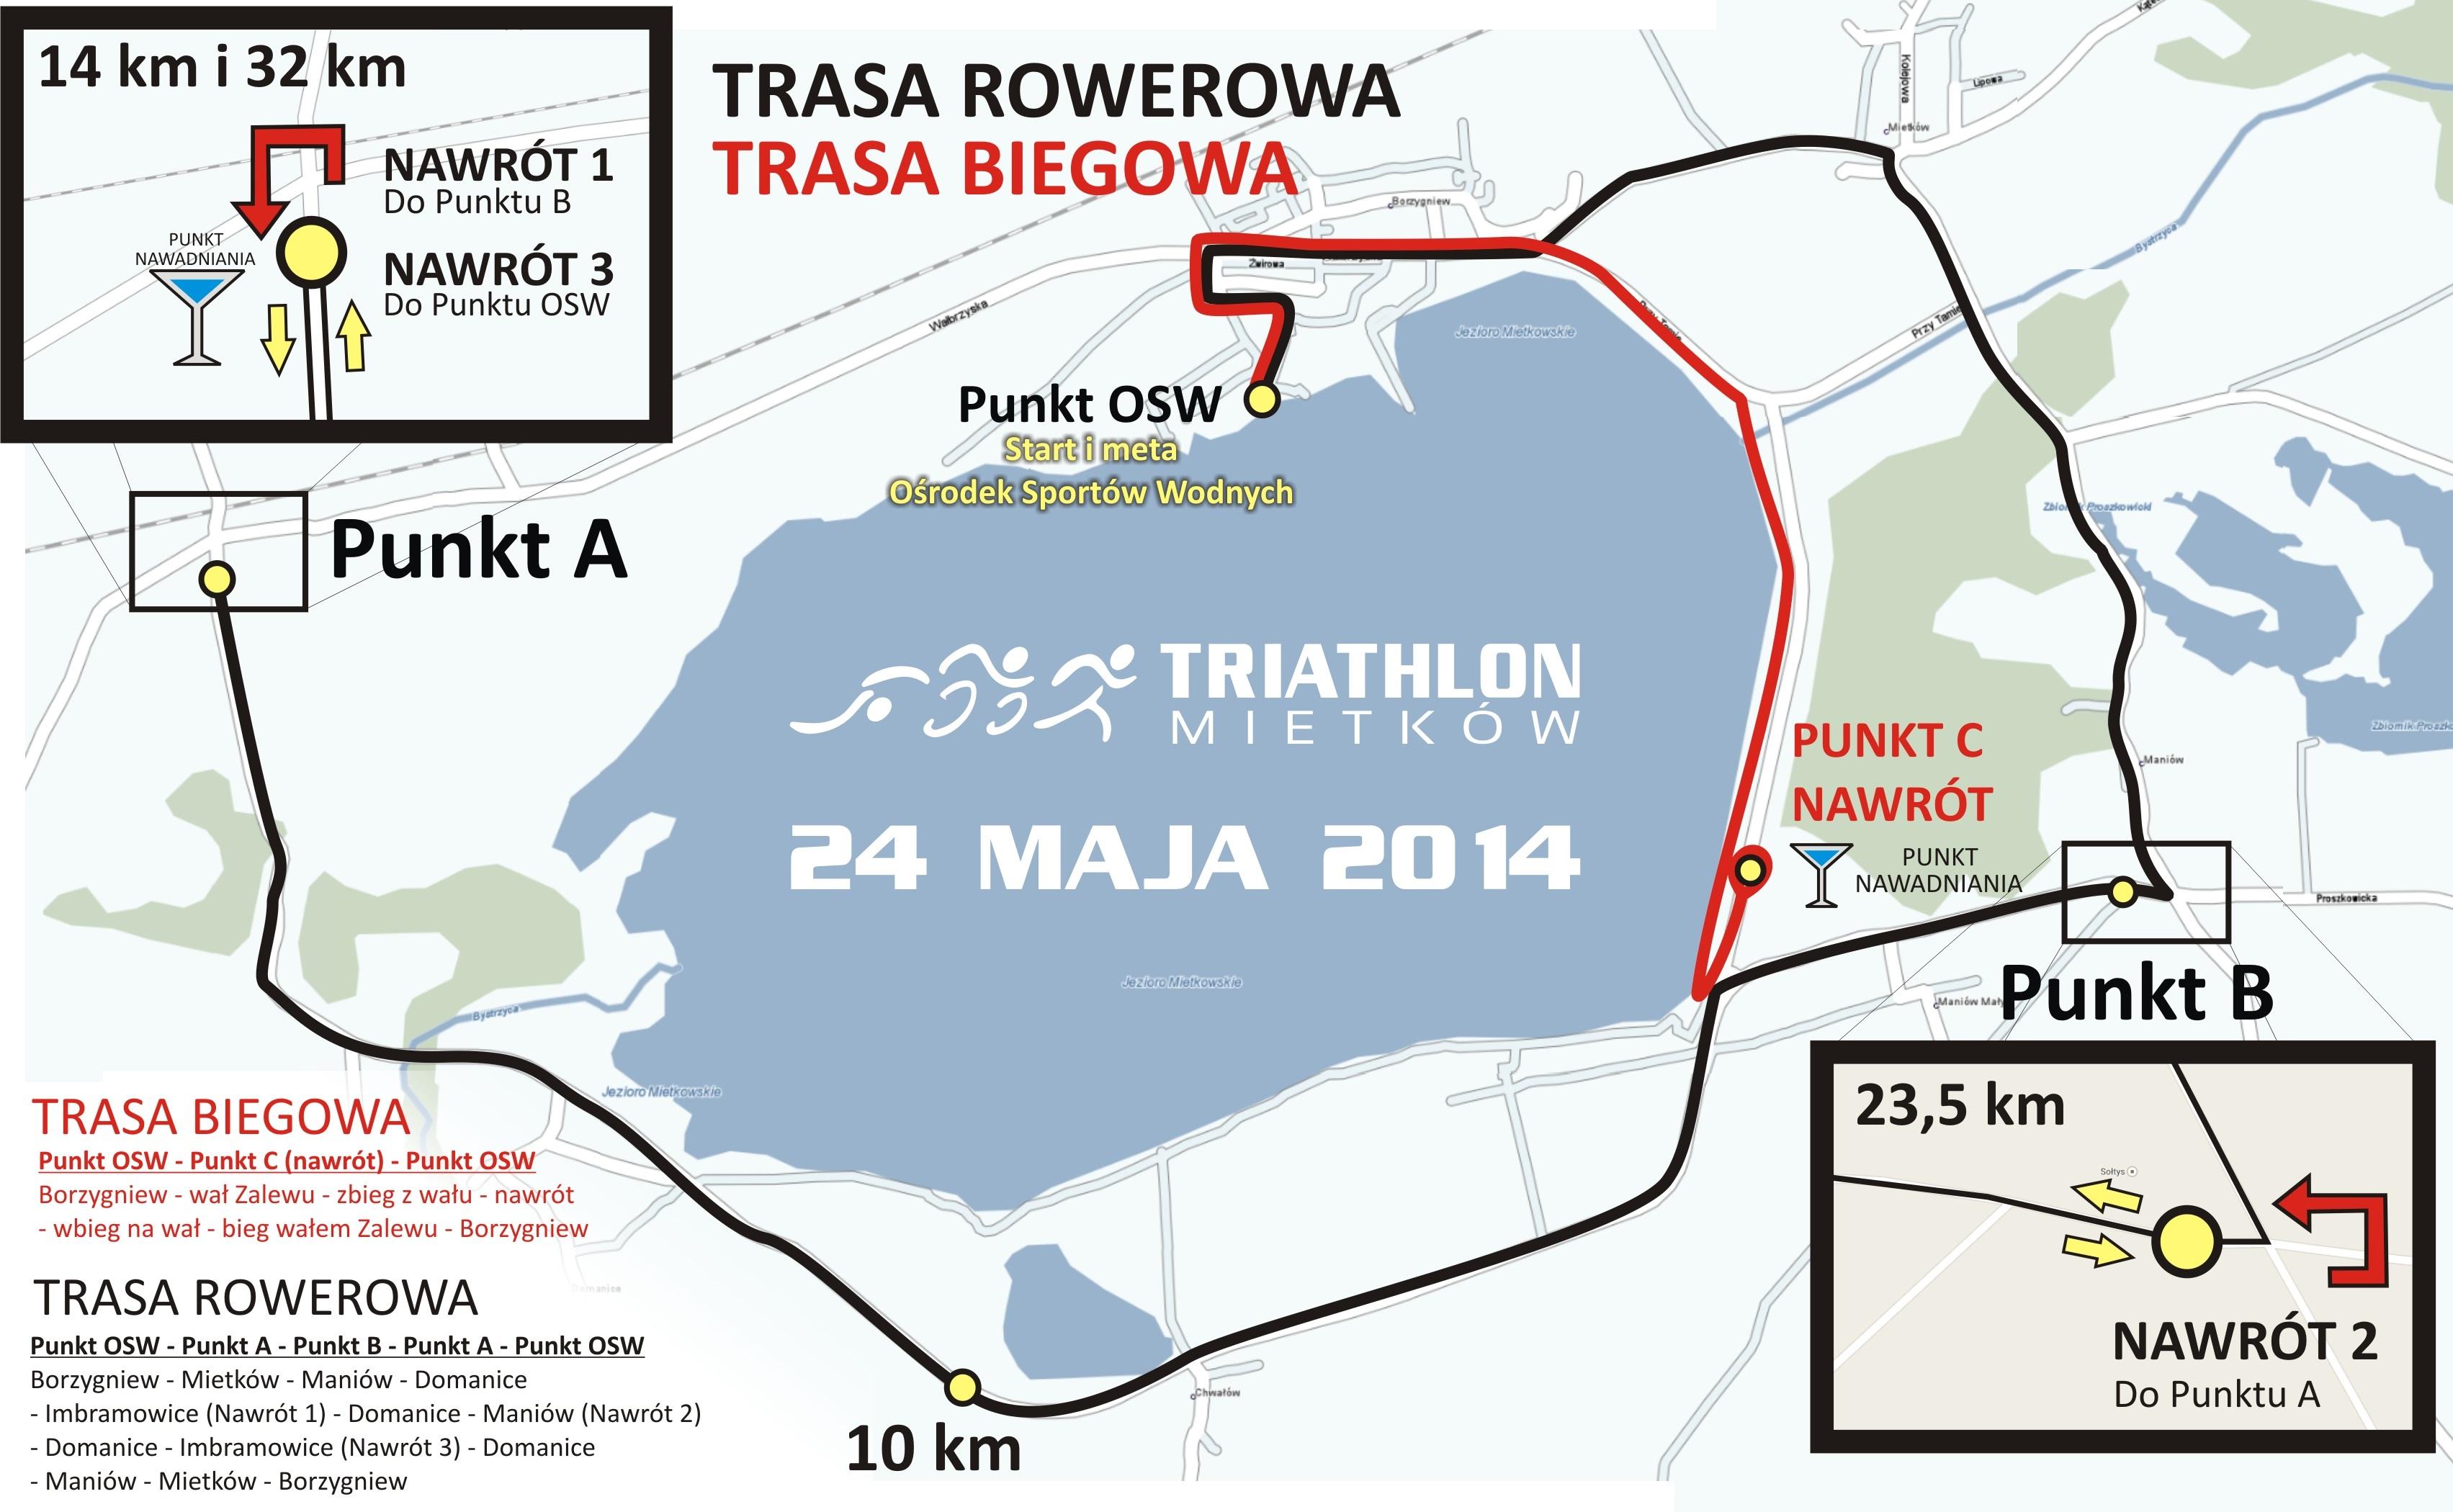 Mapa Triathlon Mietków